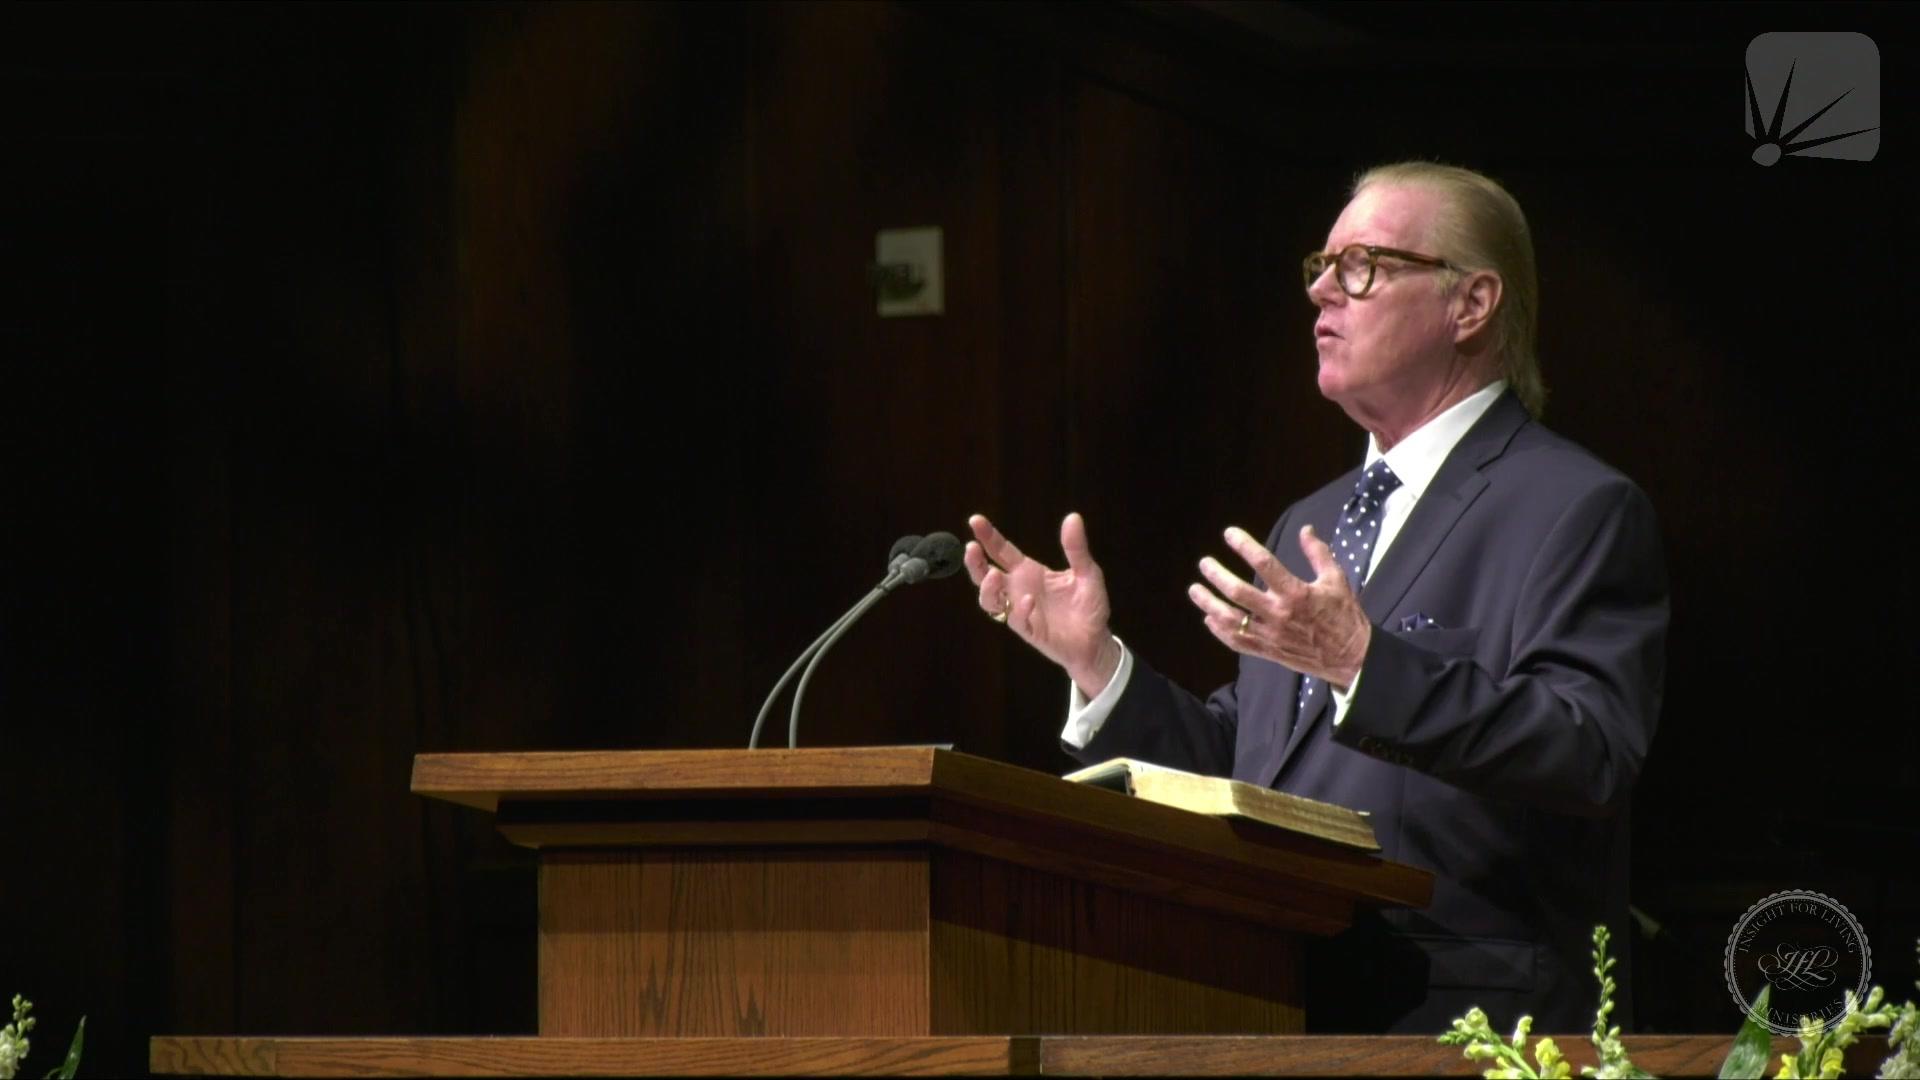 Rev. Bill Butterworth in pulpit on 20210725